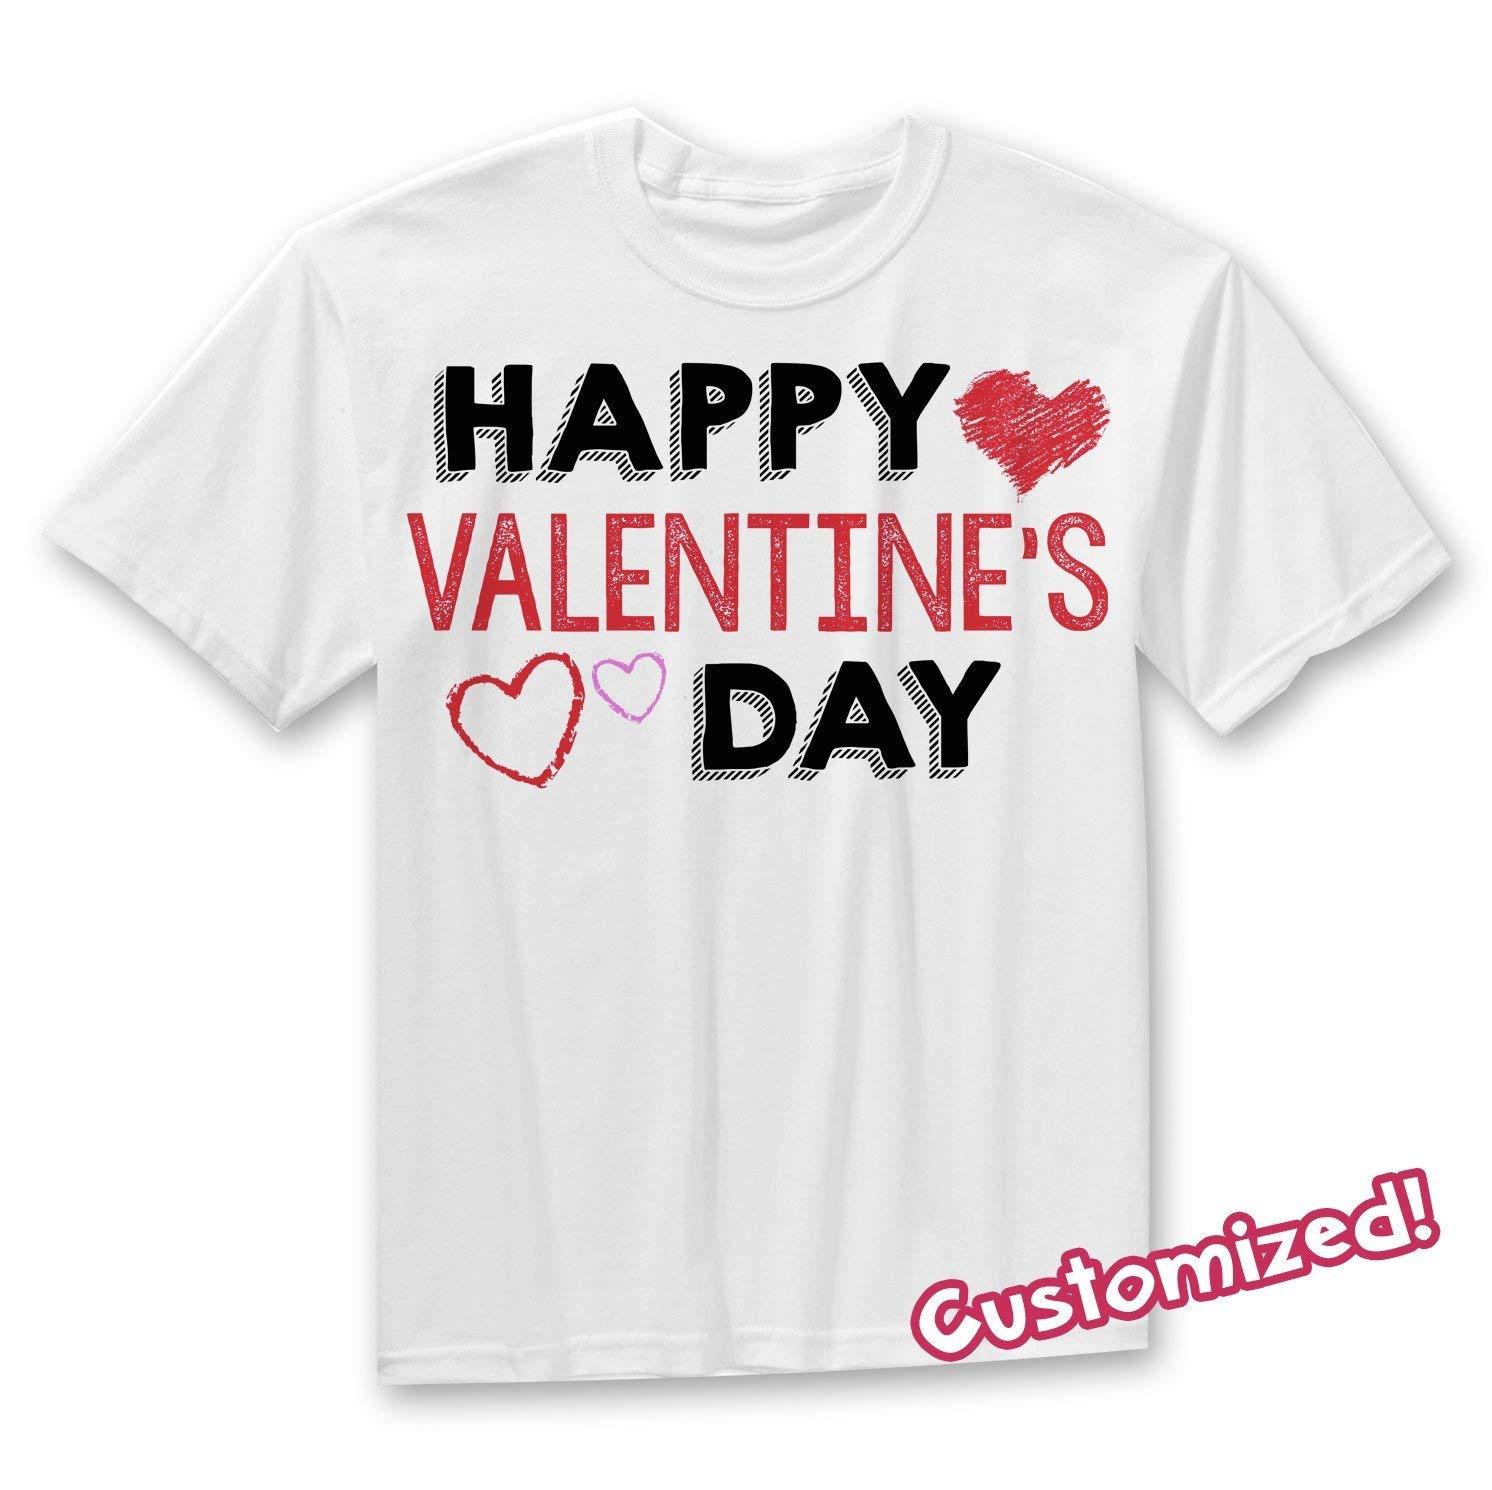 Cheap Valentines Shirt Find Valentines Shirt Deals On Line At